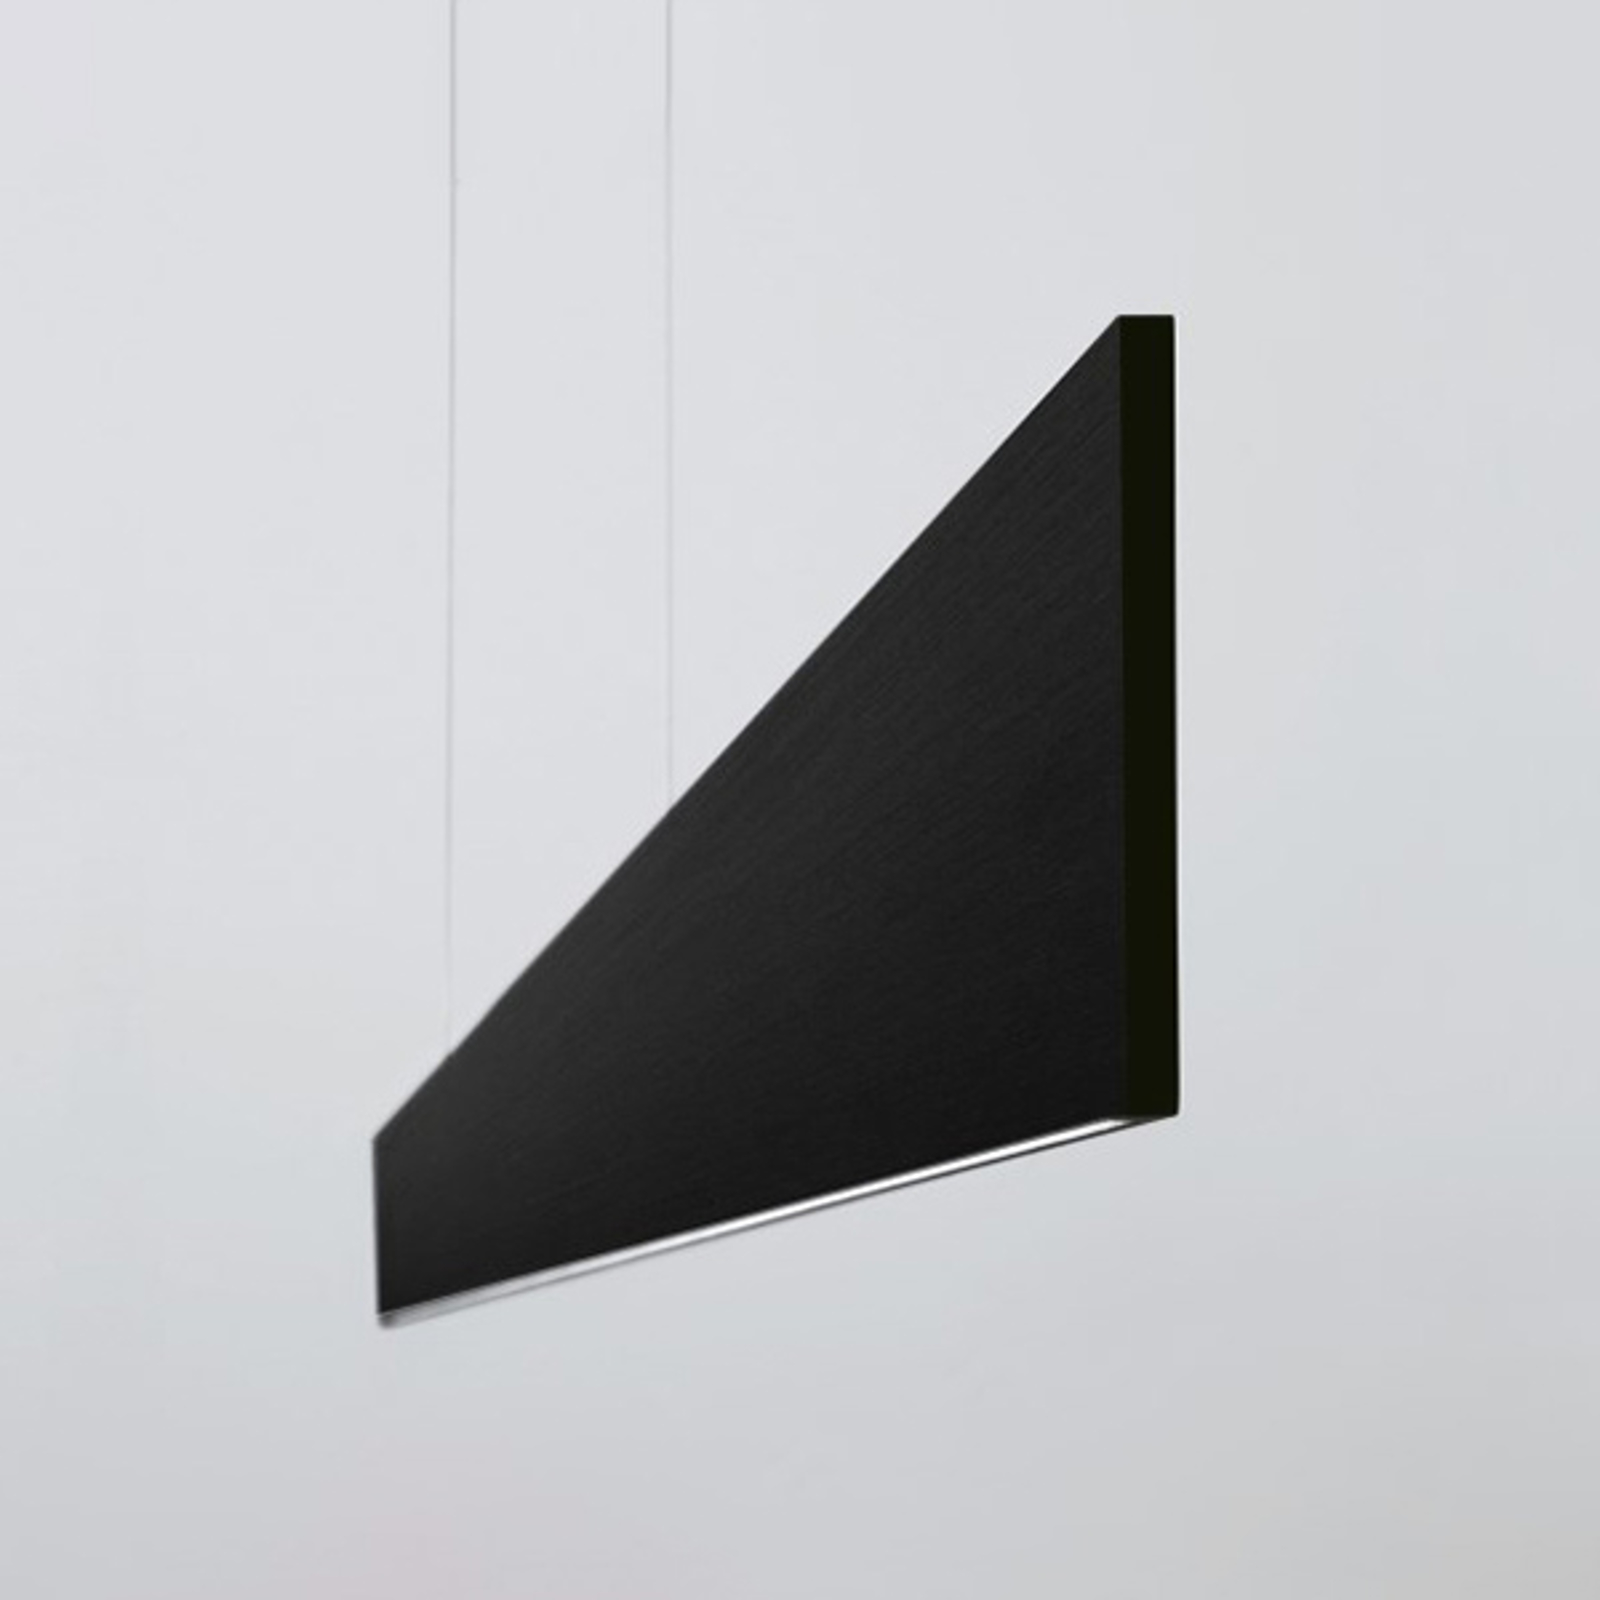 LED-riippuvalo After 8 122cm 1-10V 4 000 K musta